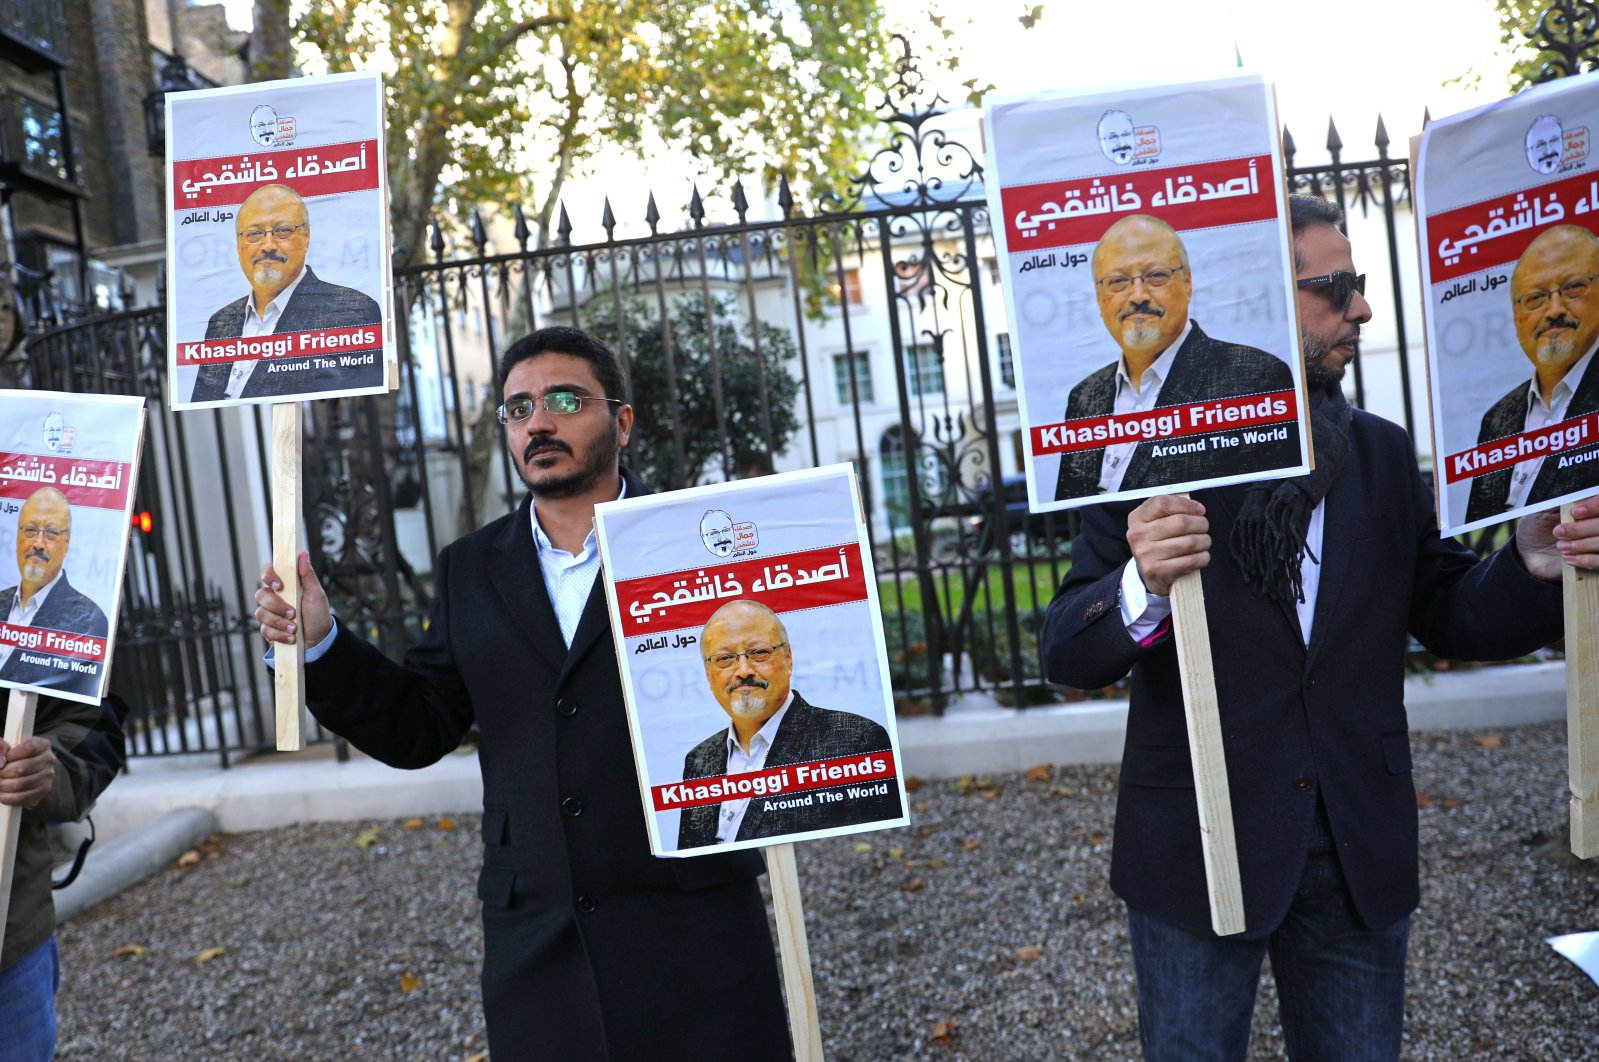 People protest against the killing of journalist Jamal Khashoggi outside the Saudi Arabian Embassy in London, Britain, Oct. 26, 2018. (Reuters Photo)